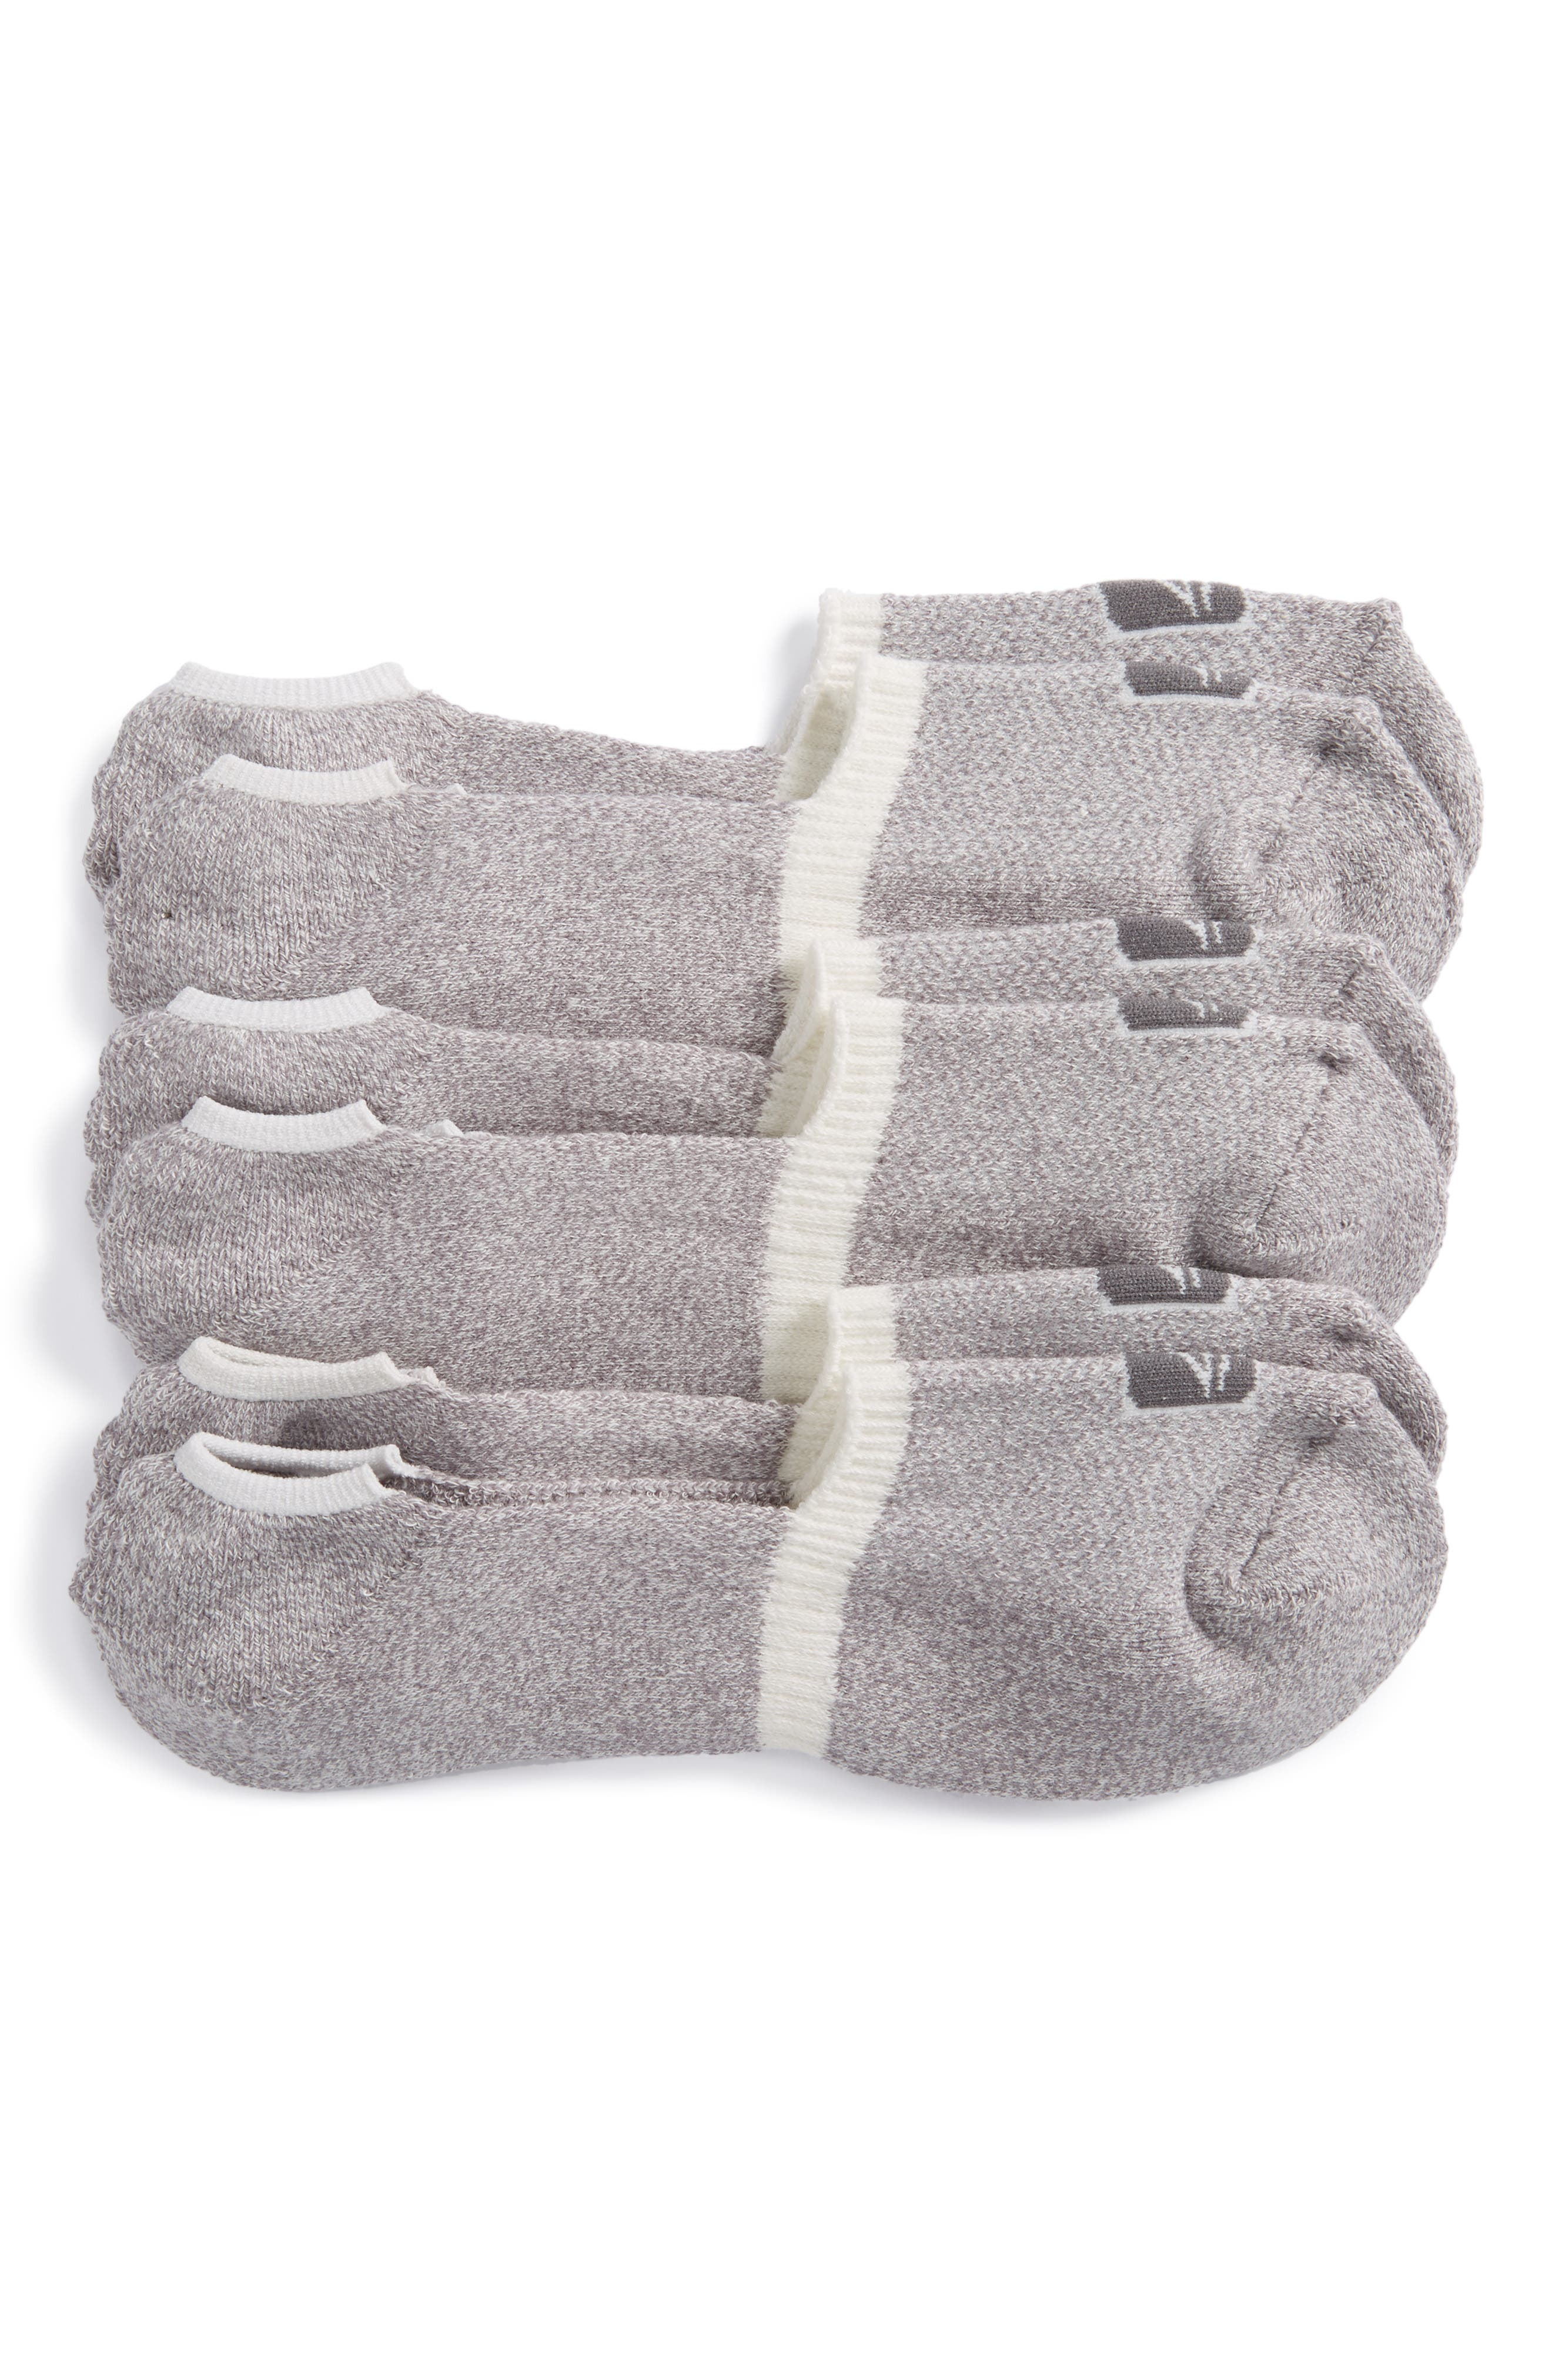 3-Pack No-Show Liner Socks,                             Alternate thumbnail 2, color,                             100